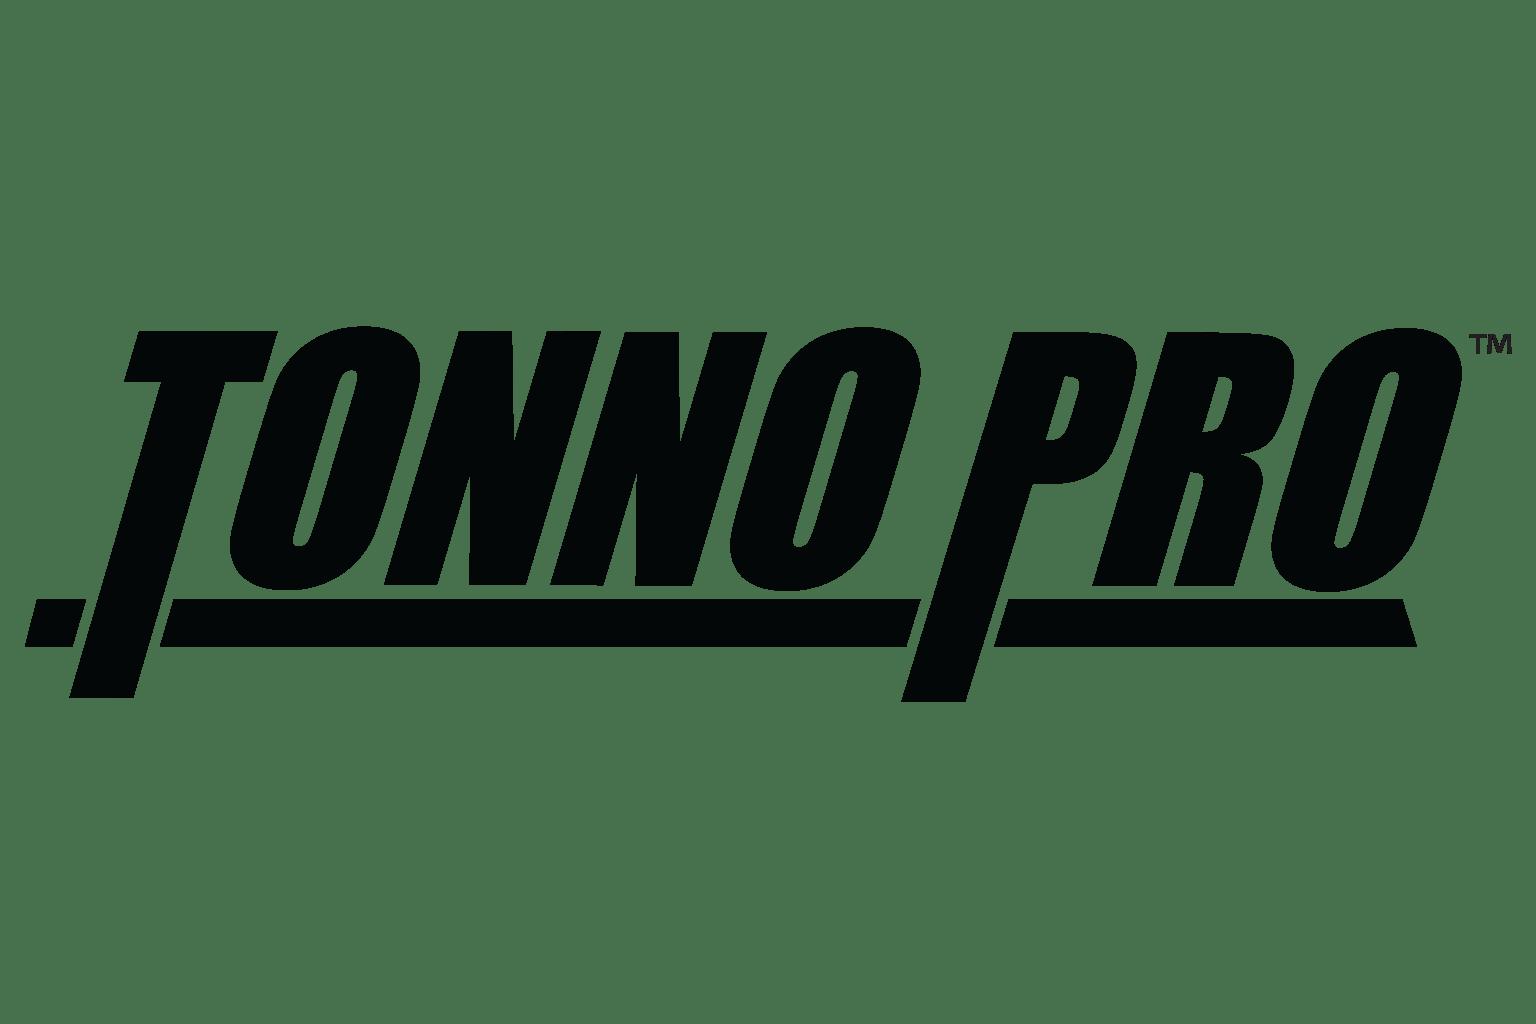 Tonno Pro